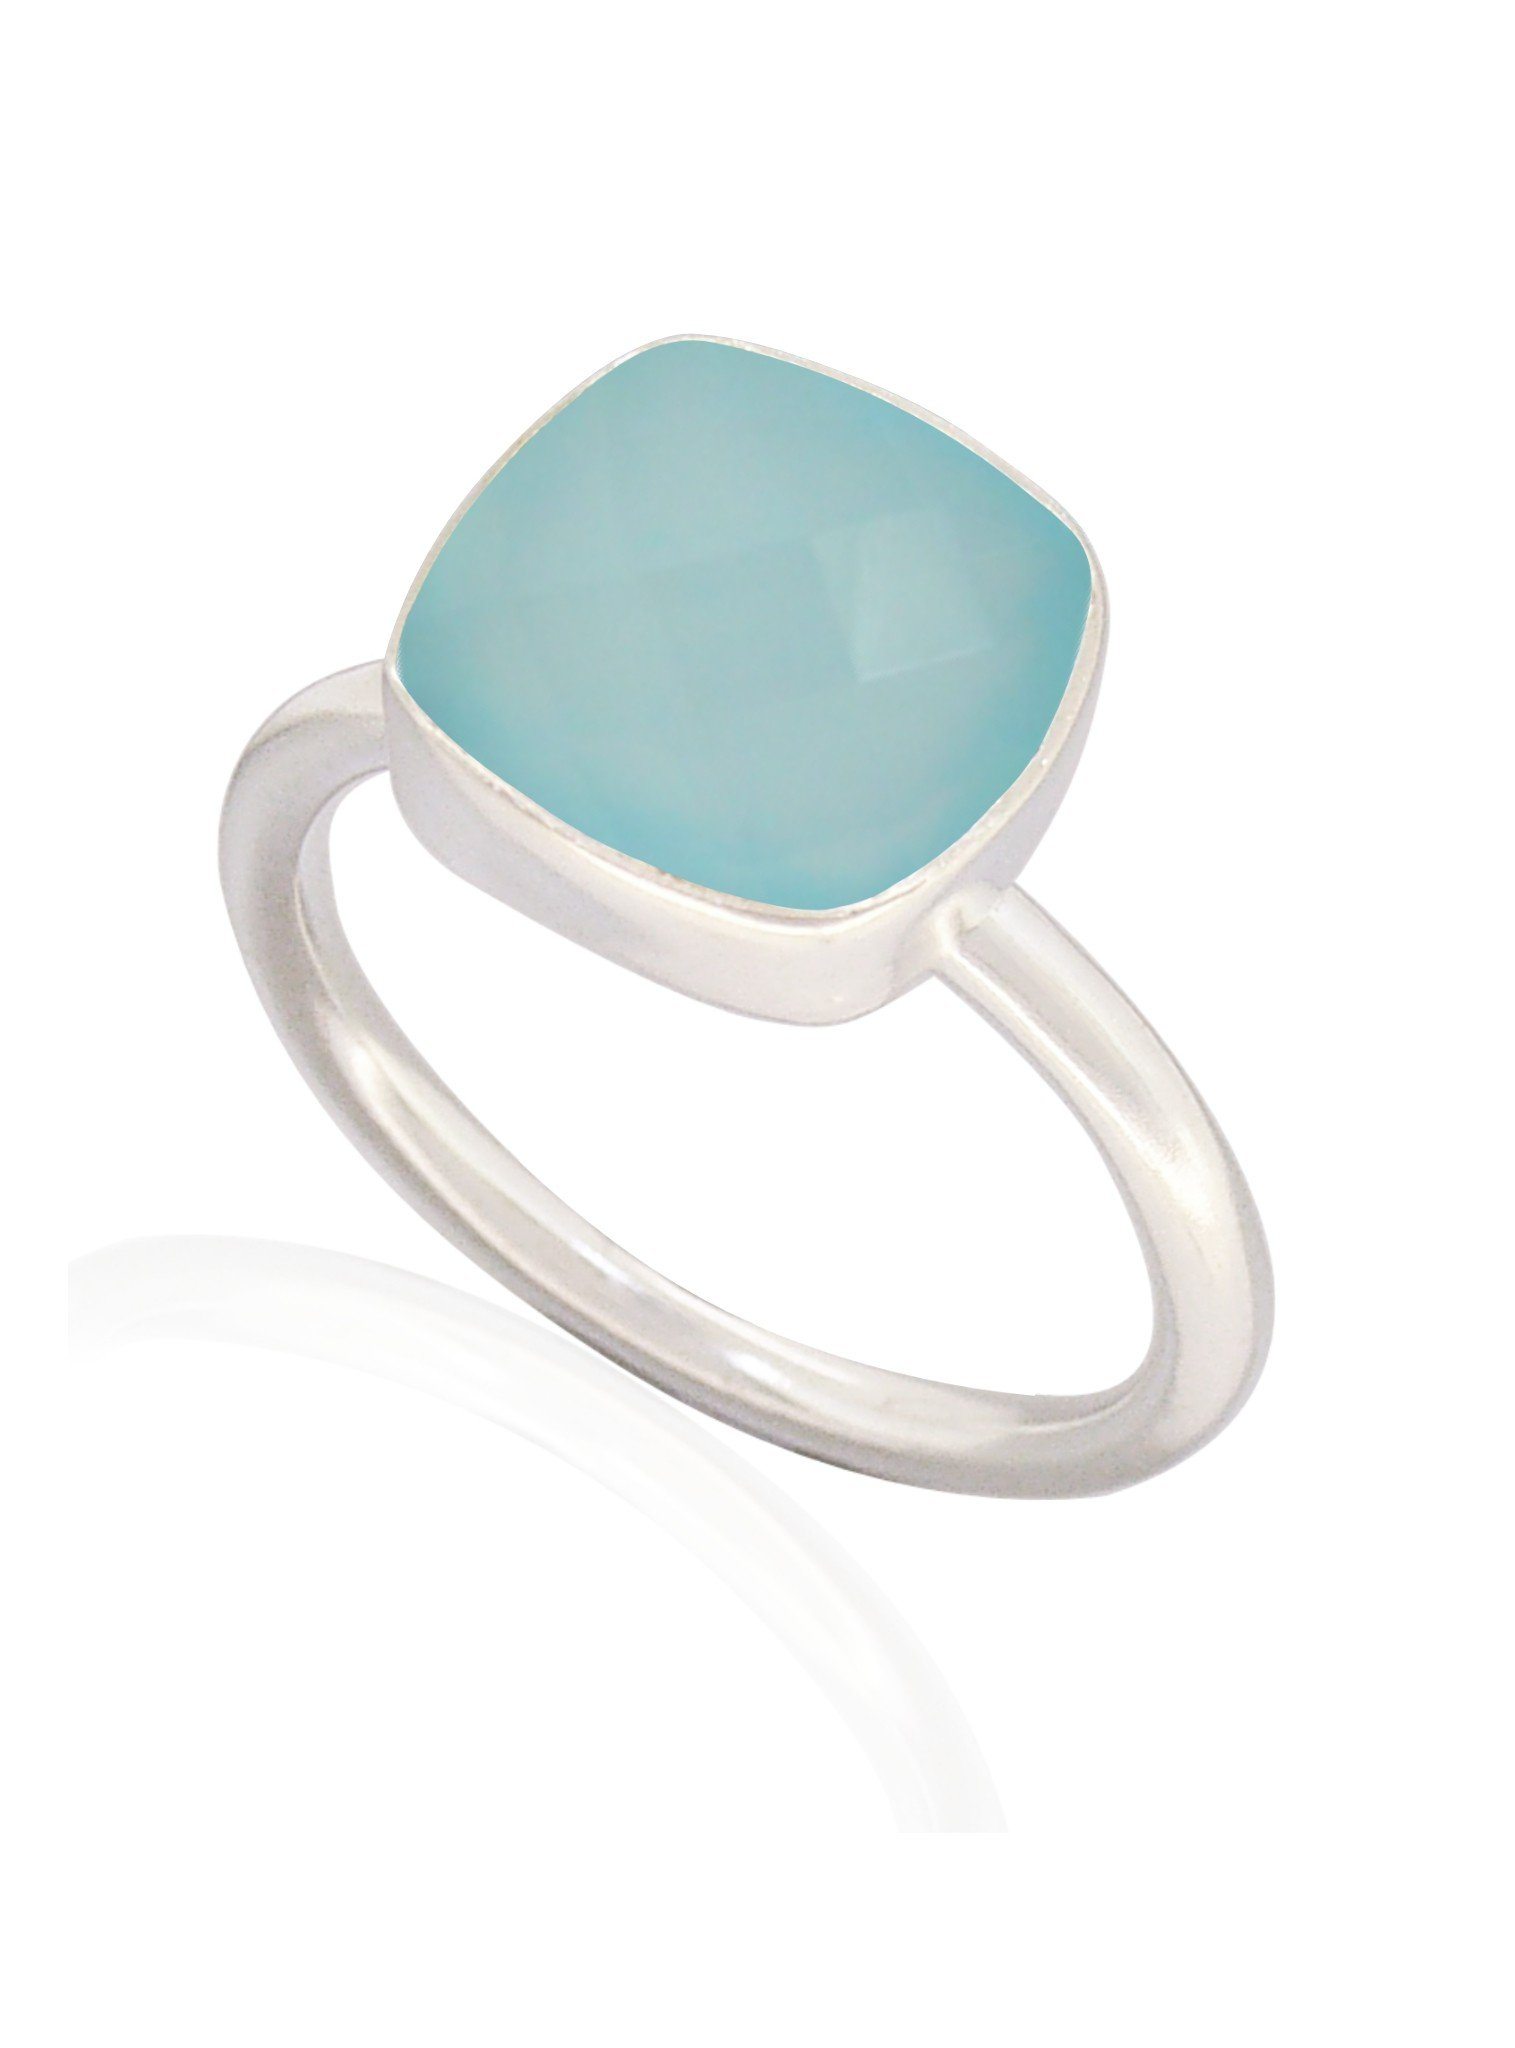 Indie Aqua Chalcedony Gemstone Ring in Silver